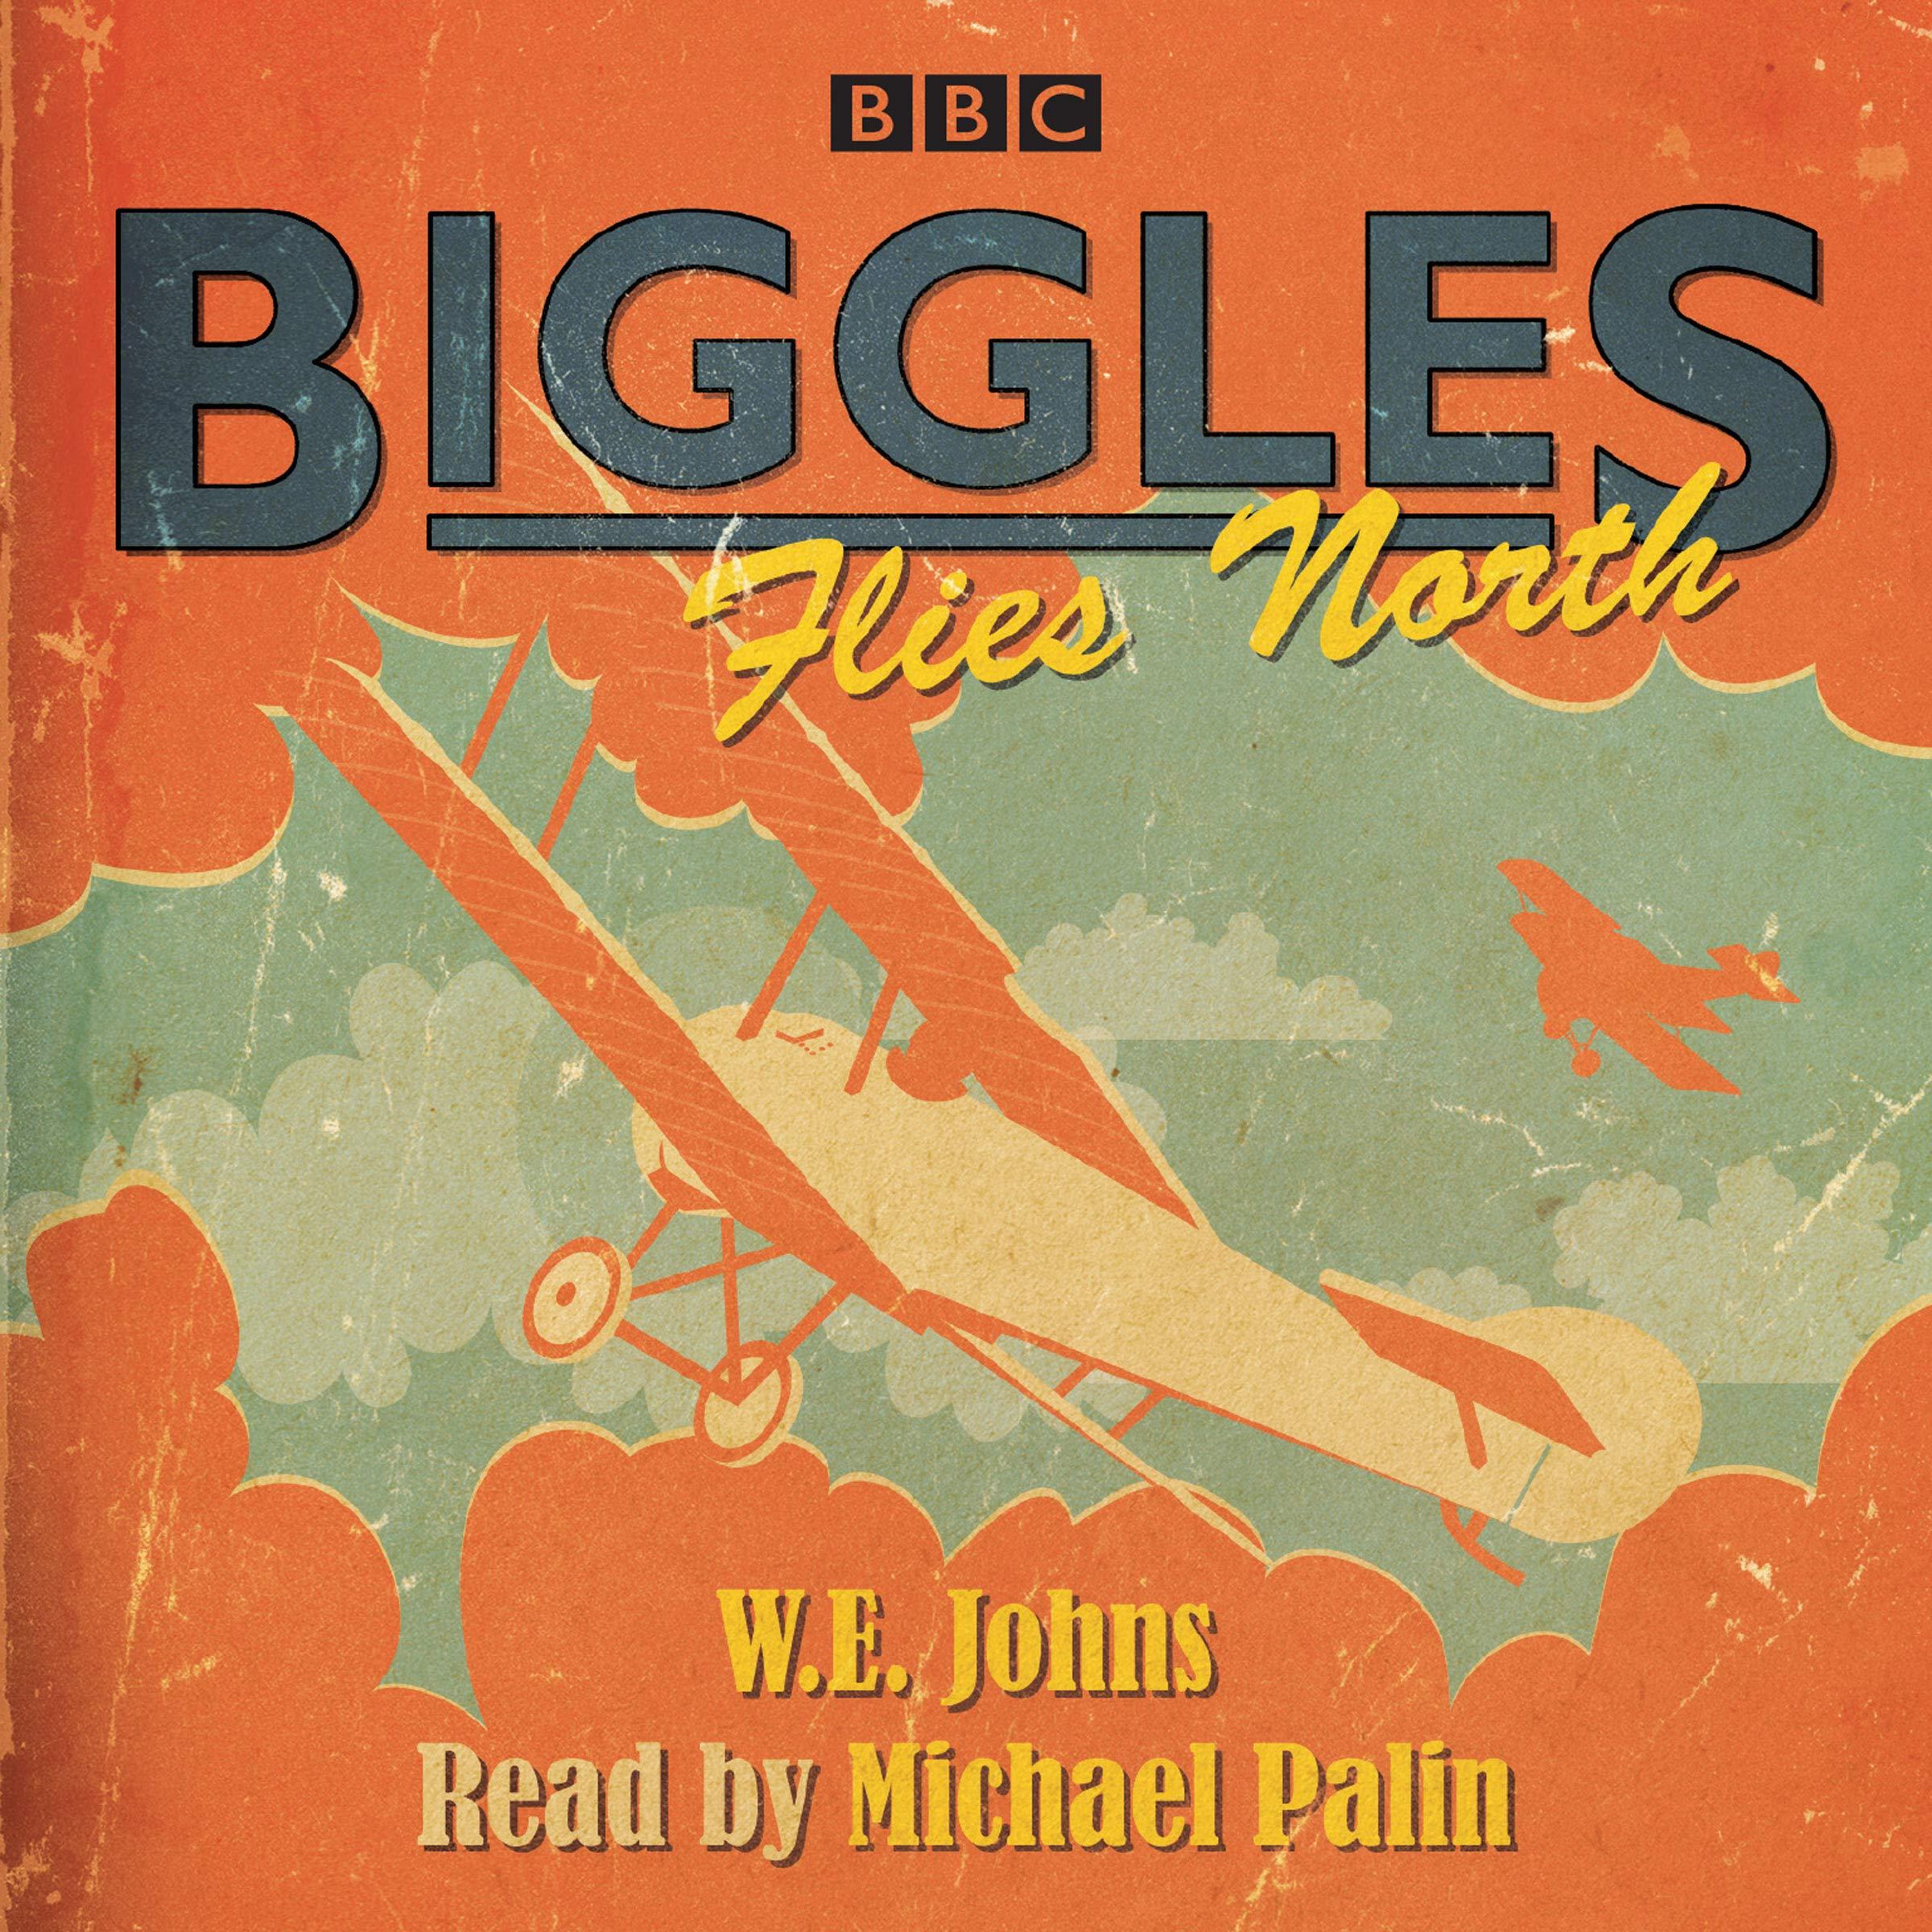 Biggles Flies North (BBC Audio): Amazon.co.uk: W E Johns, Michael Palin:  9781787530614: Books